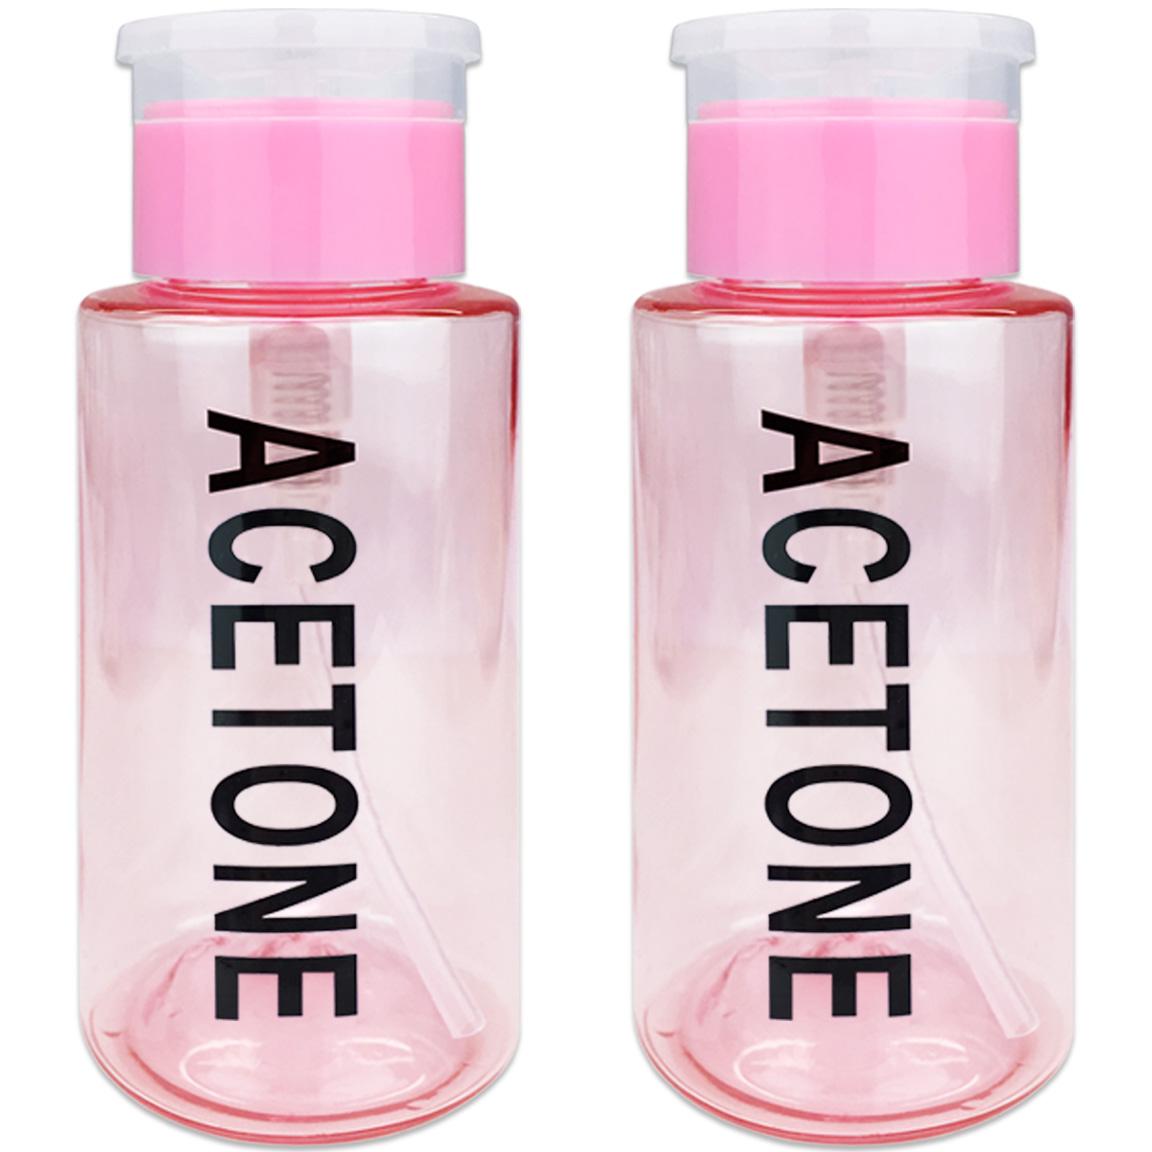 Pana High Quality 7oz Liquid Pump Dispenser With Acetone Label - Teal (2 Bottles)